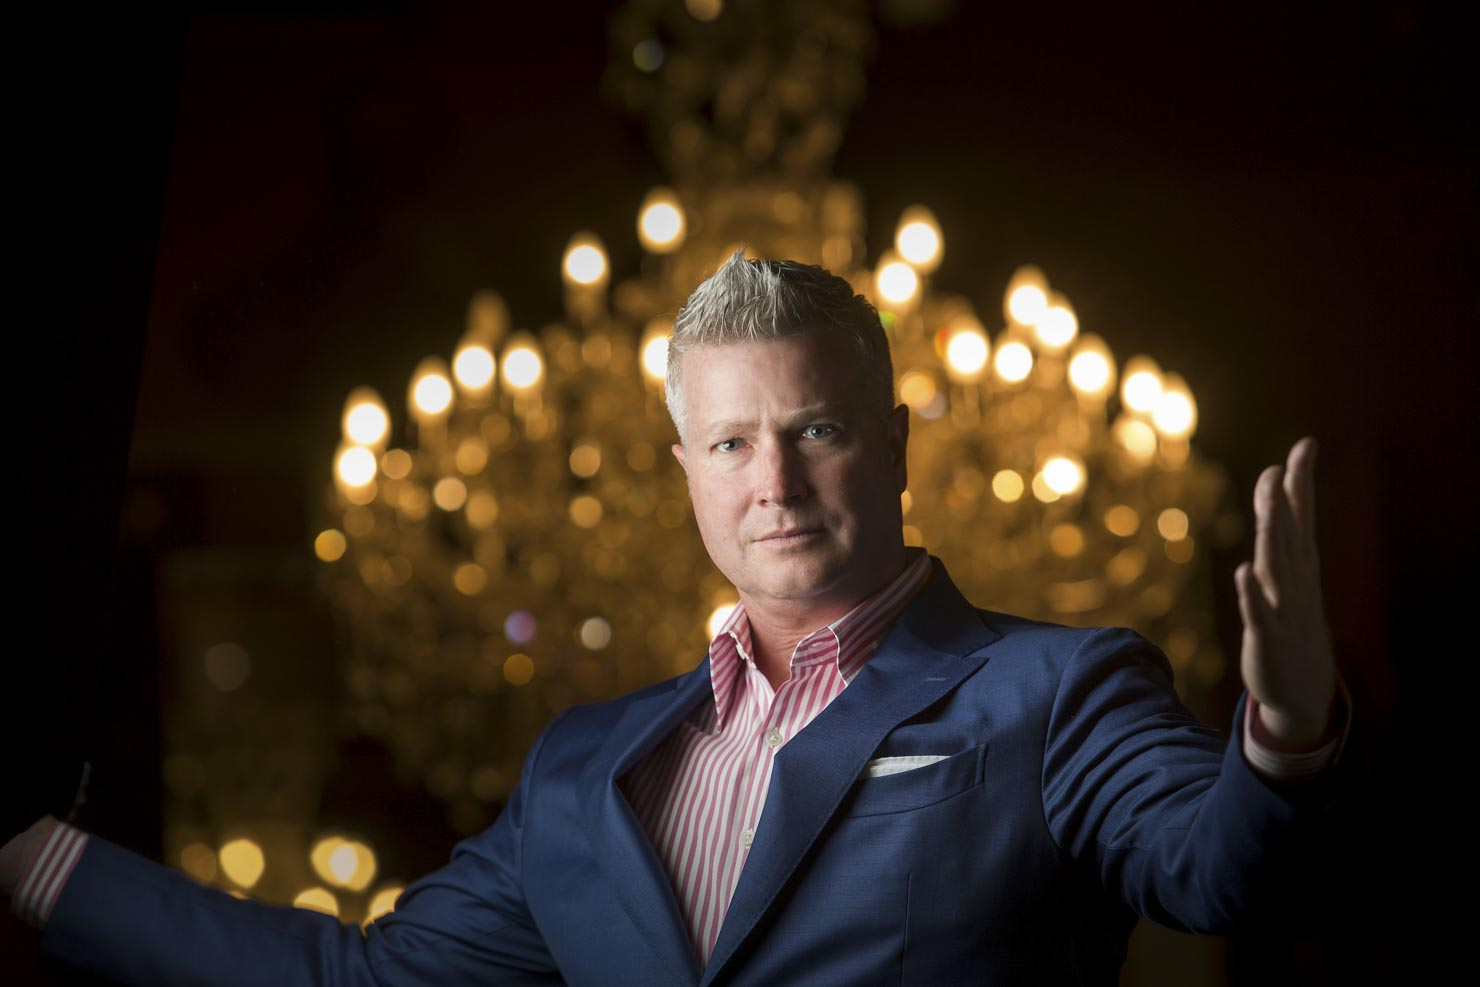 Megastar Millionaire man in front of chandelier